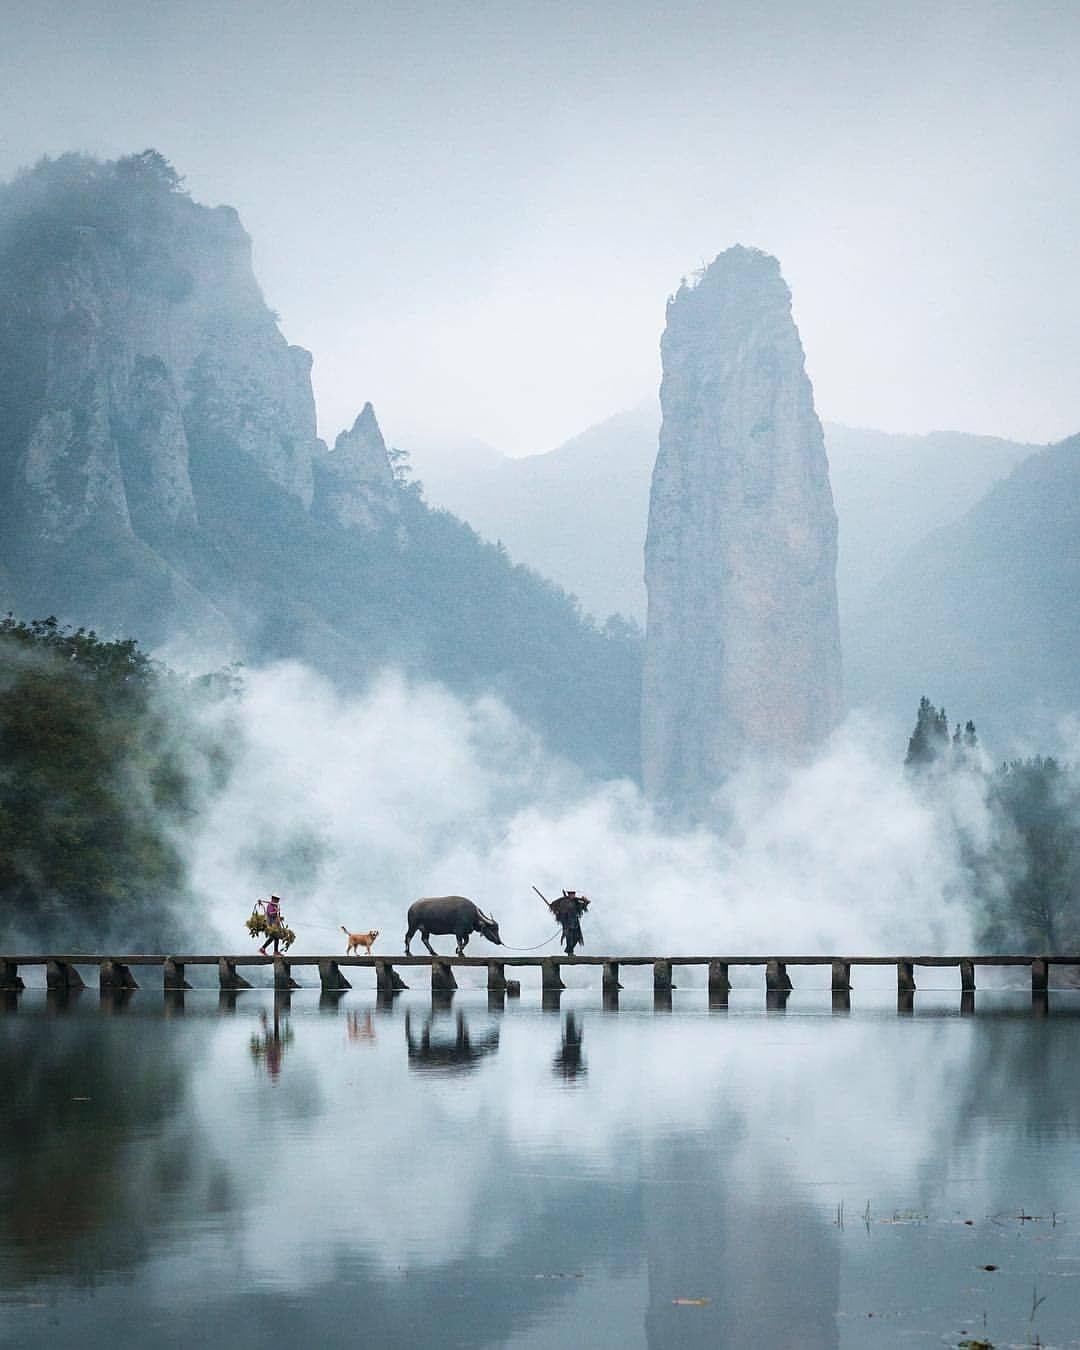 Folk Scenery On Instagram Calm And Peaceful China Photo By Jordhammond Folkscenery Follow Us Folkscener Travel And Leisure Travel Photos Travel Spot